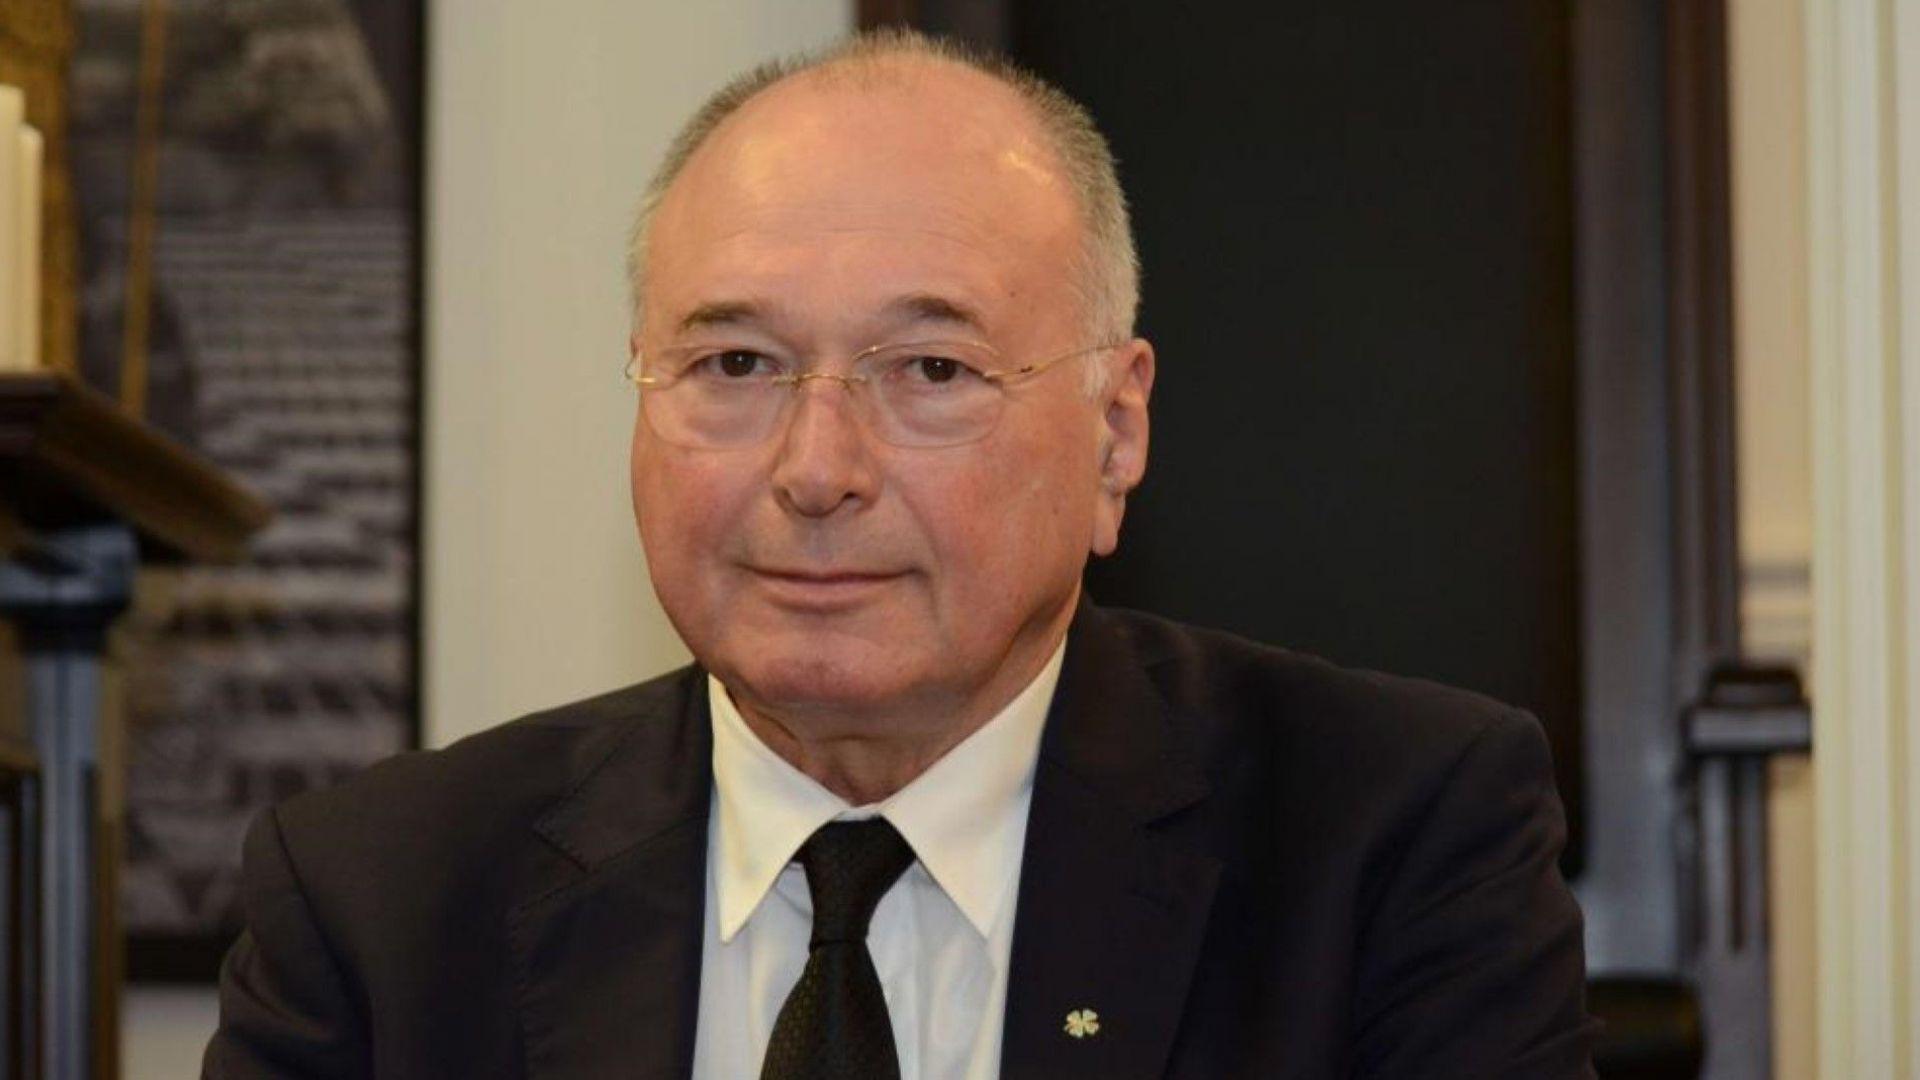 Спас Панчев: Аз и Димитър Георгиев оставаме независими депутати